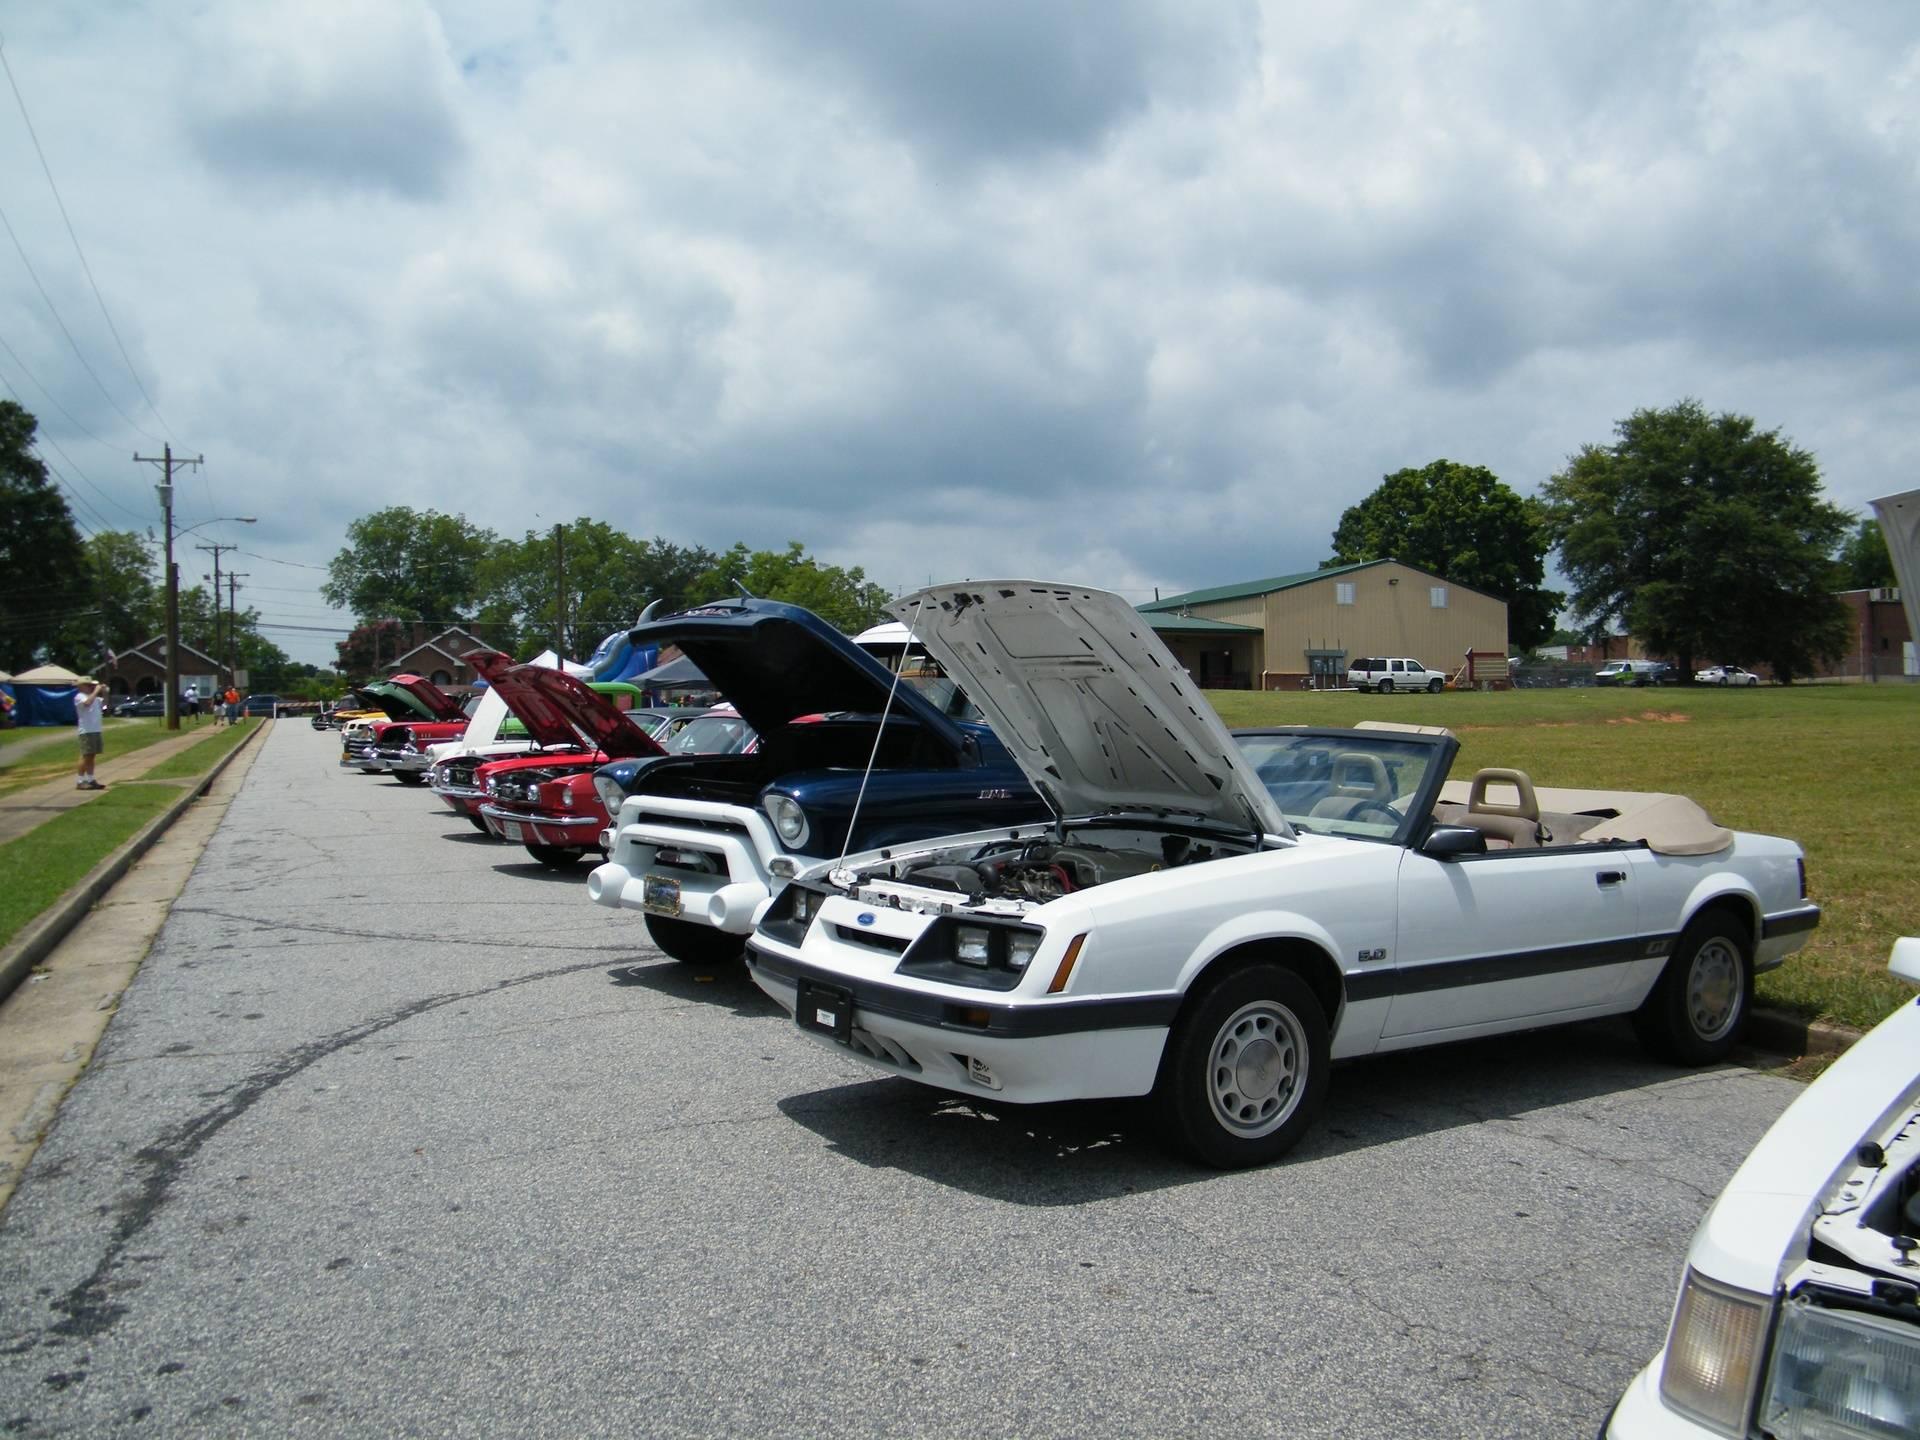 Fantastic display of winning vehicles